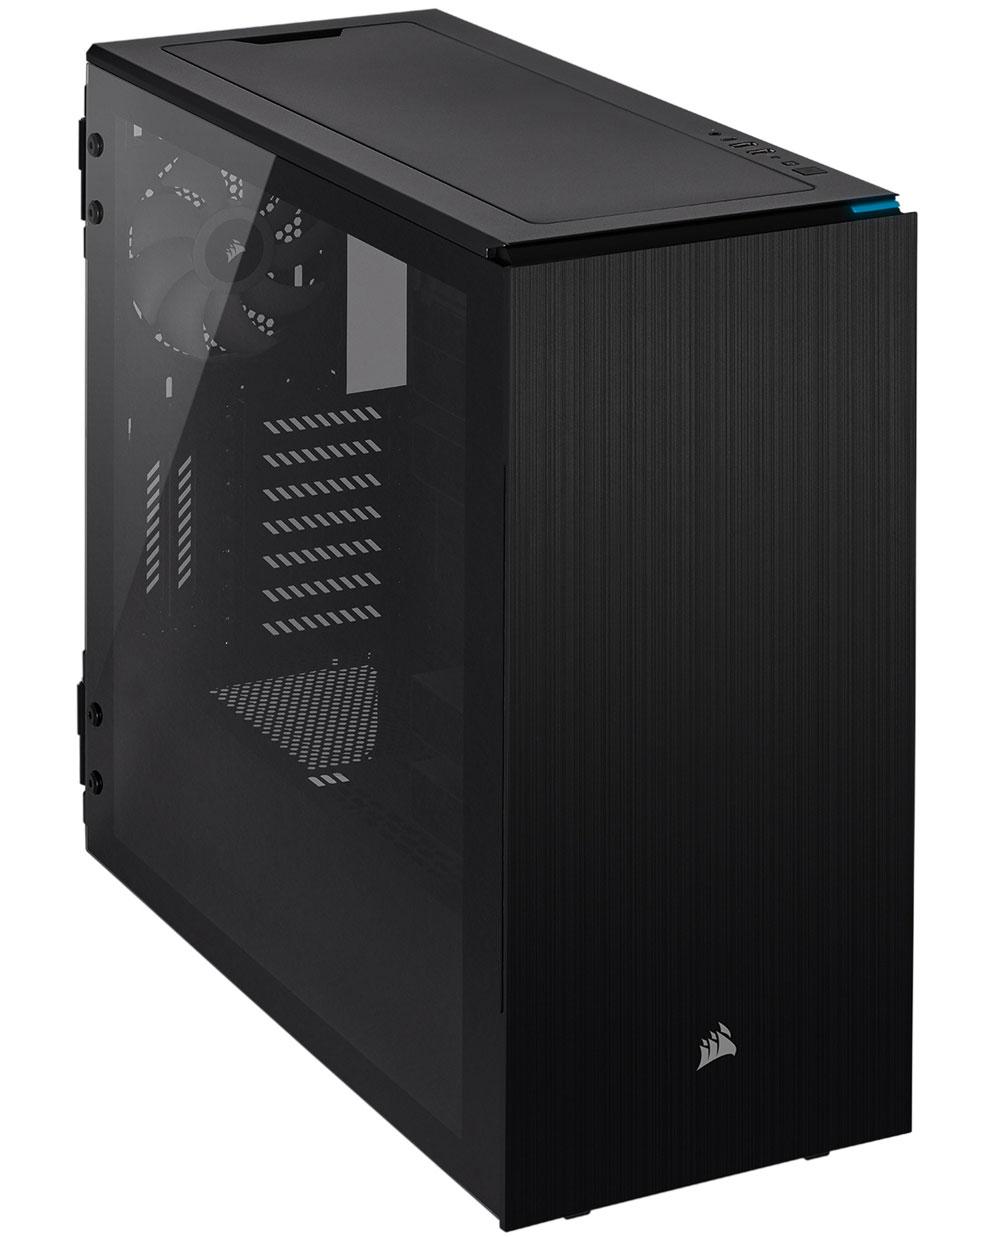 Corsair Carbide 678C Gaming Case Black